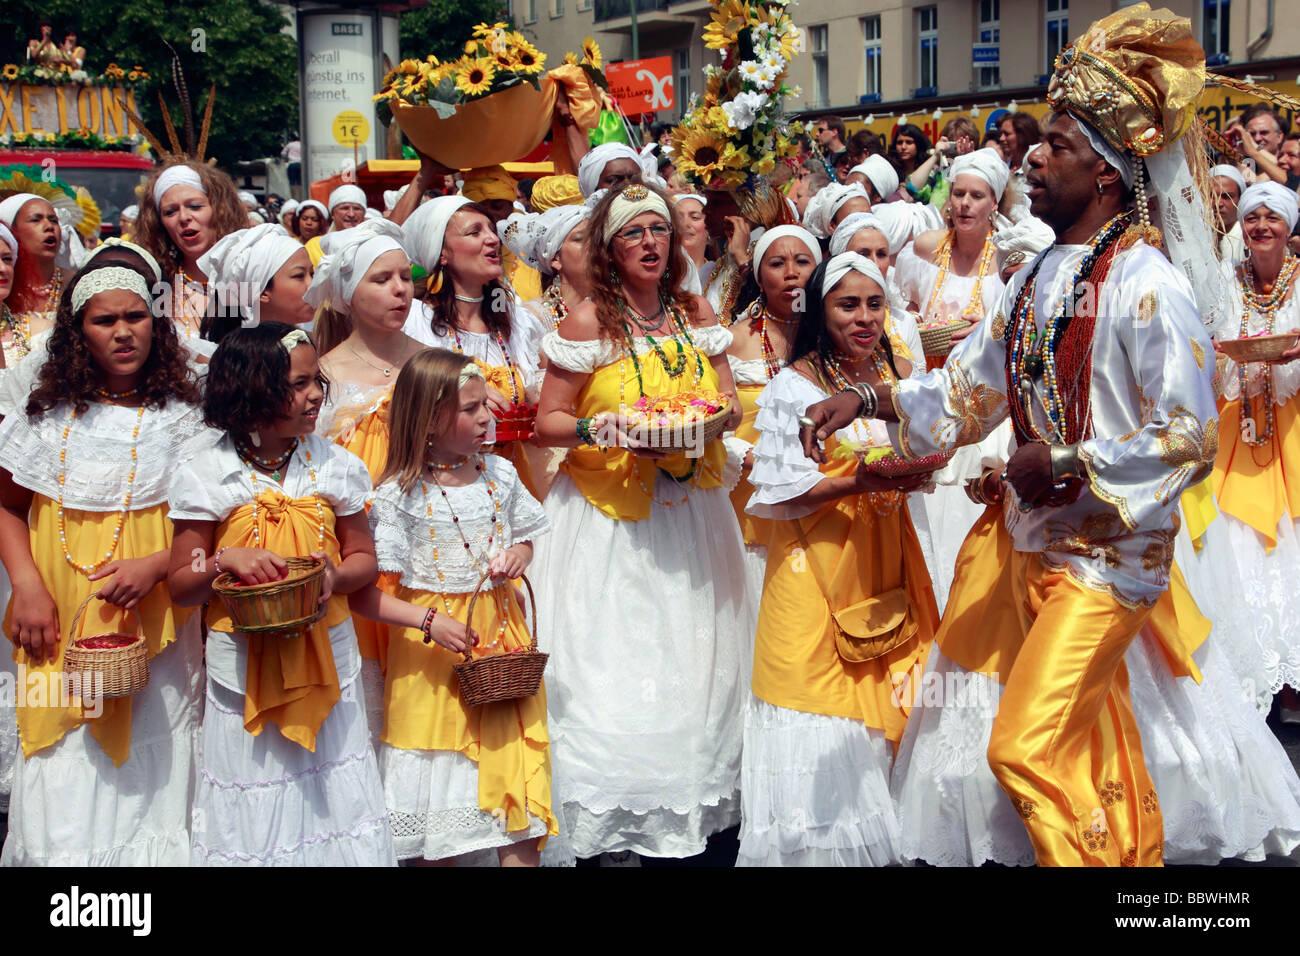 Alemania Berlín Carnaval de las culturas grupo de cantantes Imagen De Stock